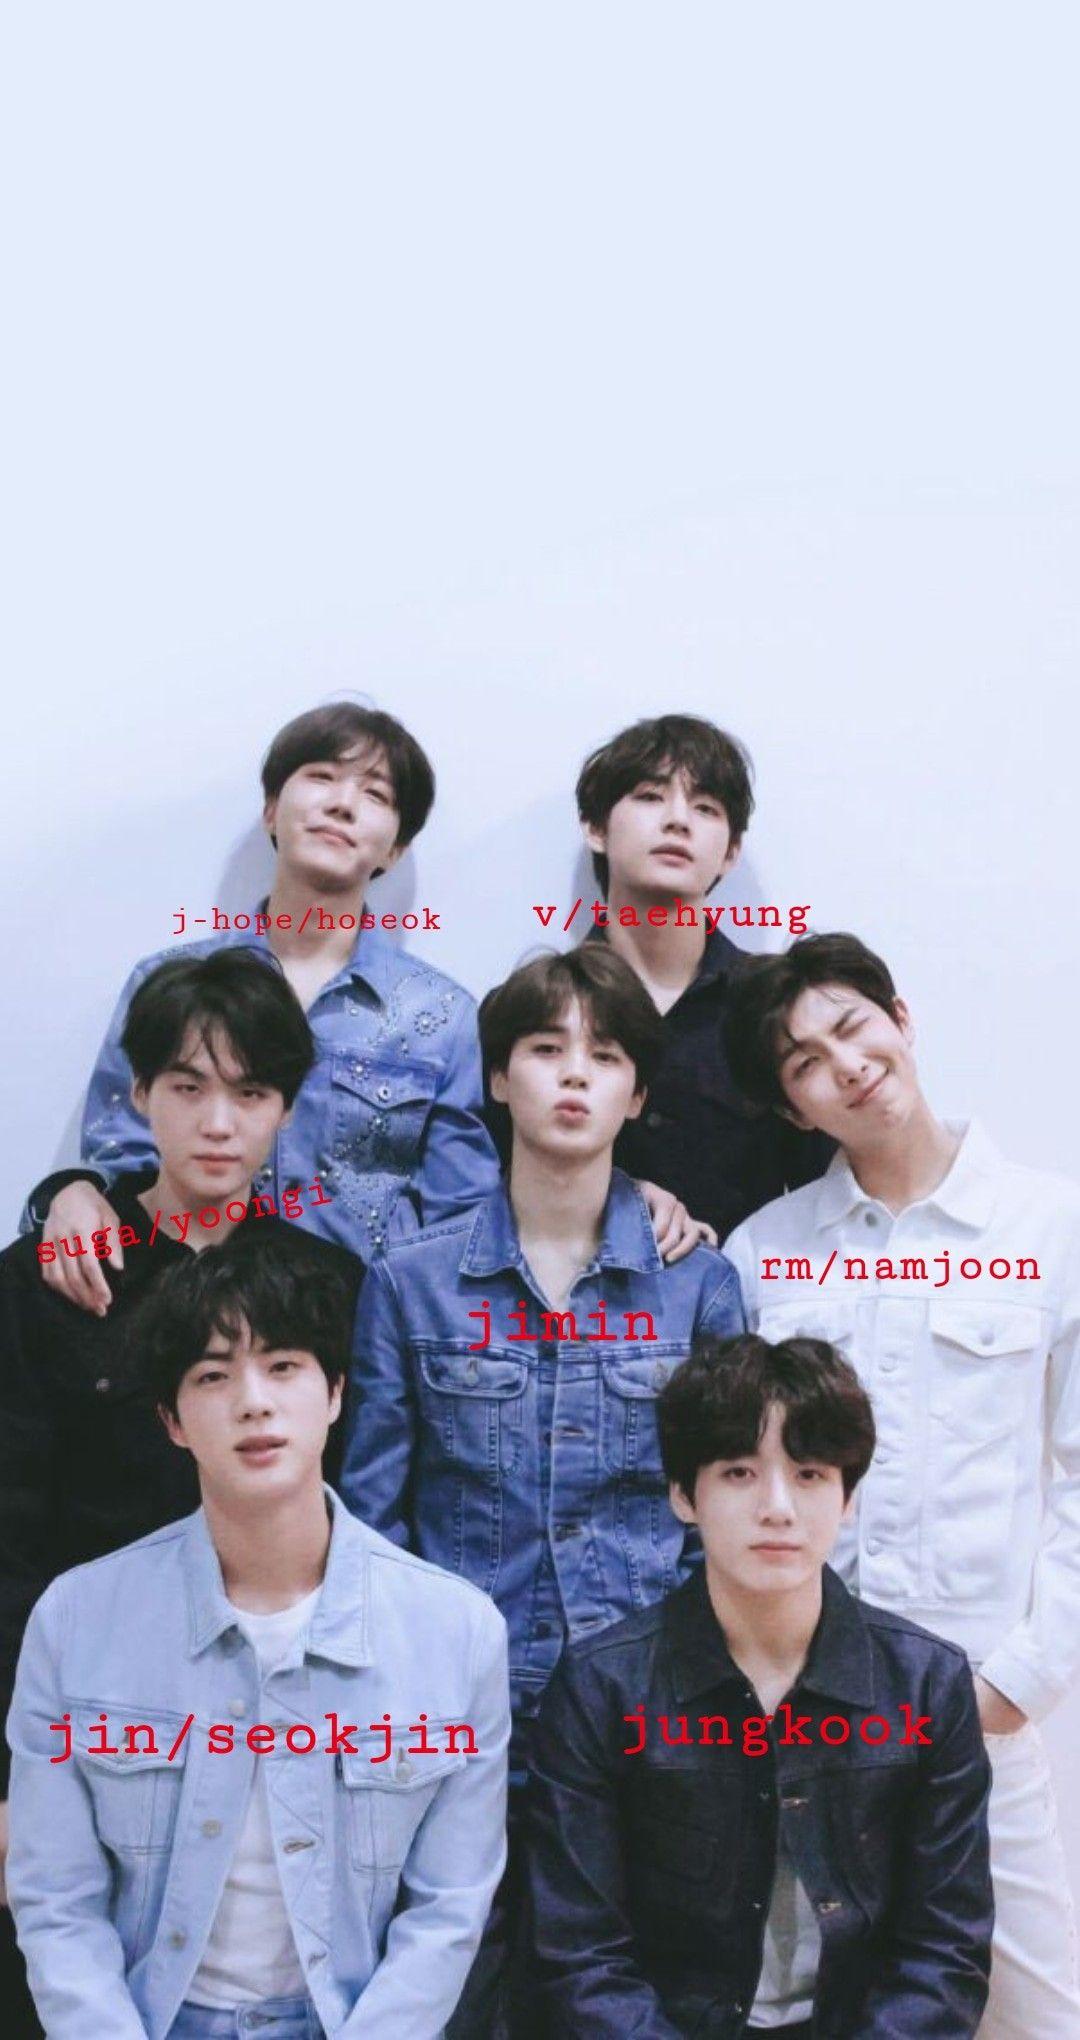 Bts Names Bts Name Bts Members Bts Members Names